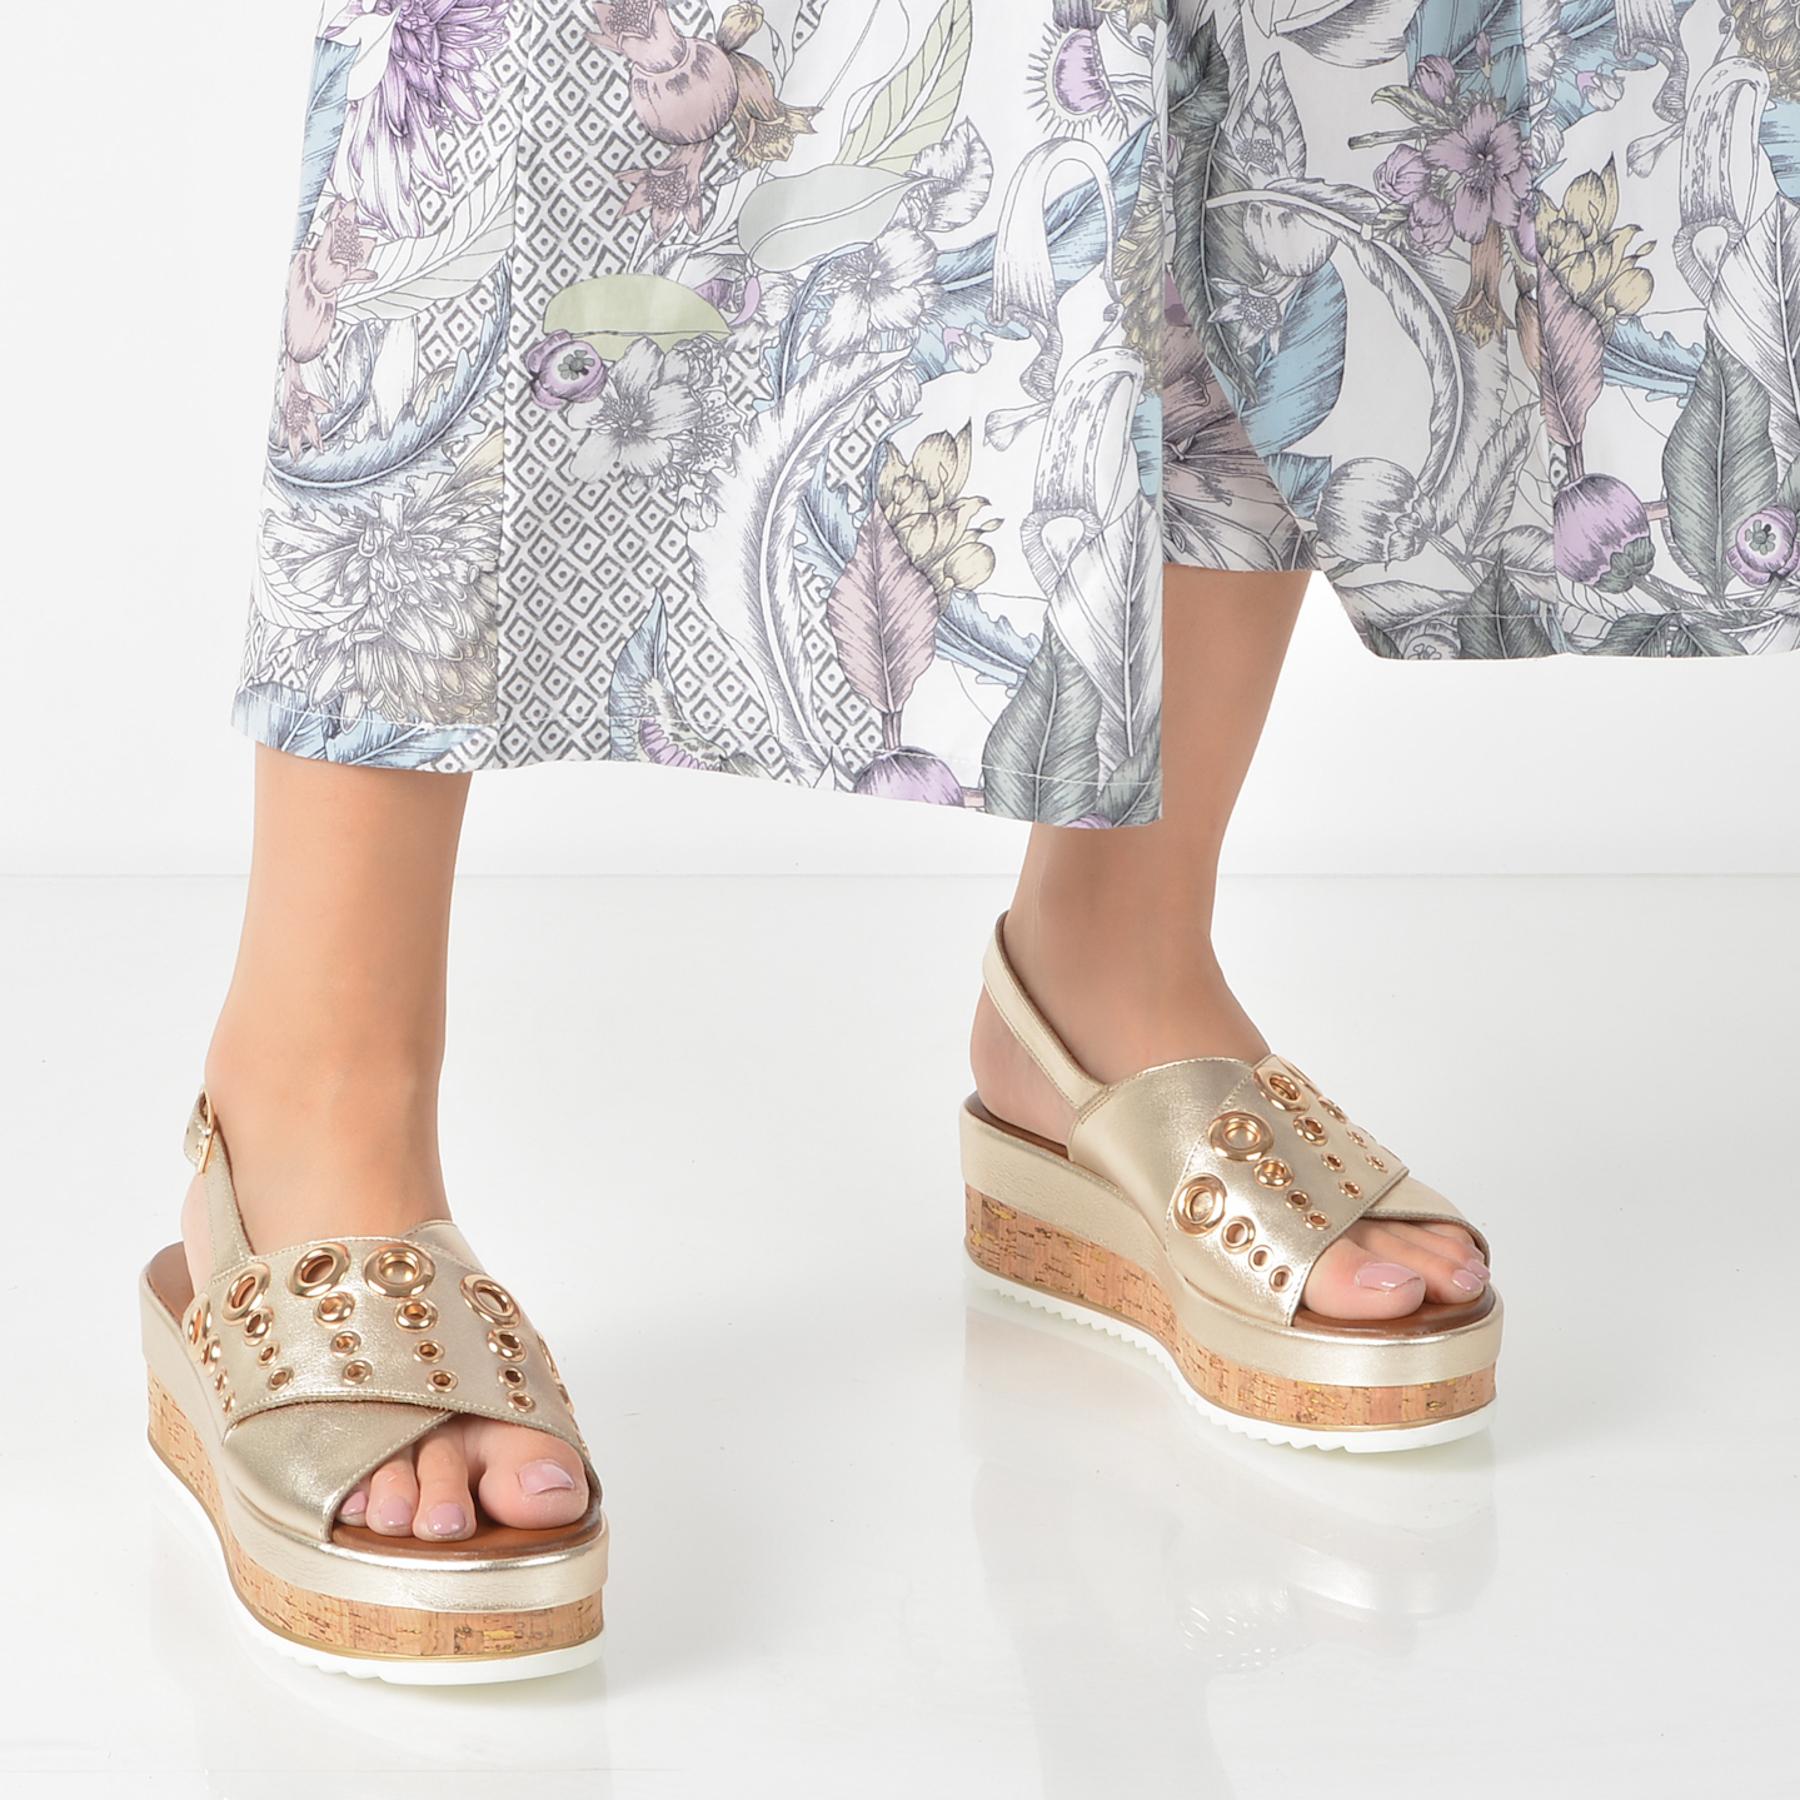 Sandale IMAGE aurii, 8836, din piele naturala